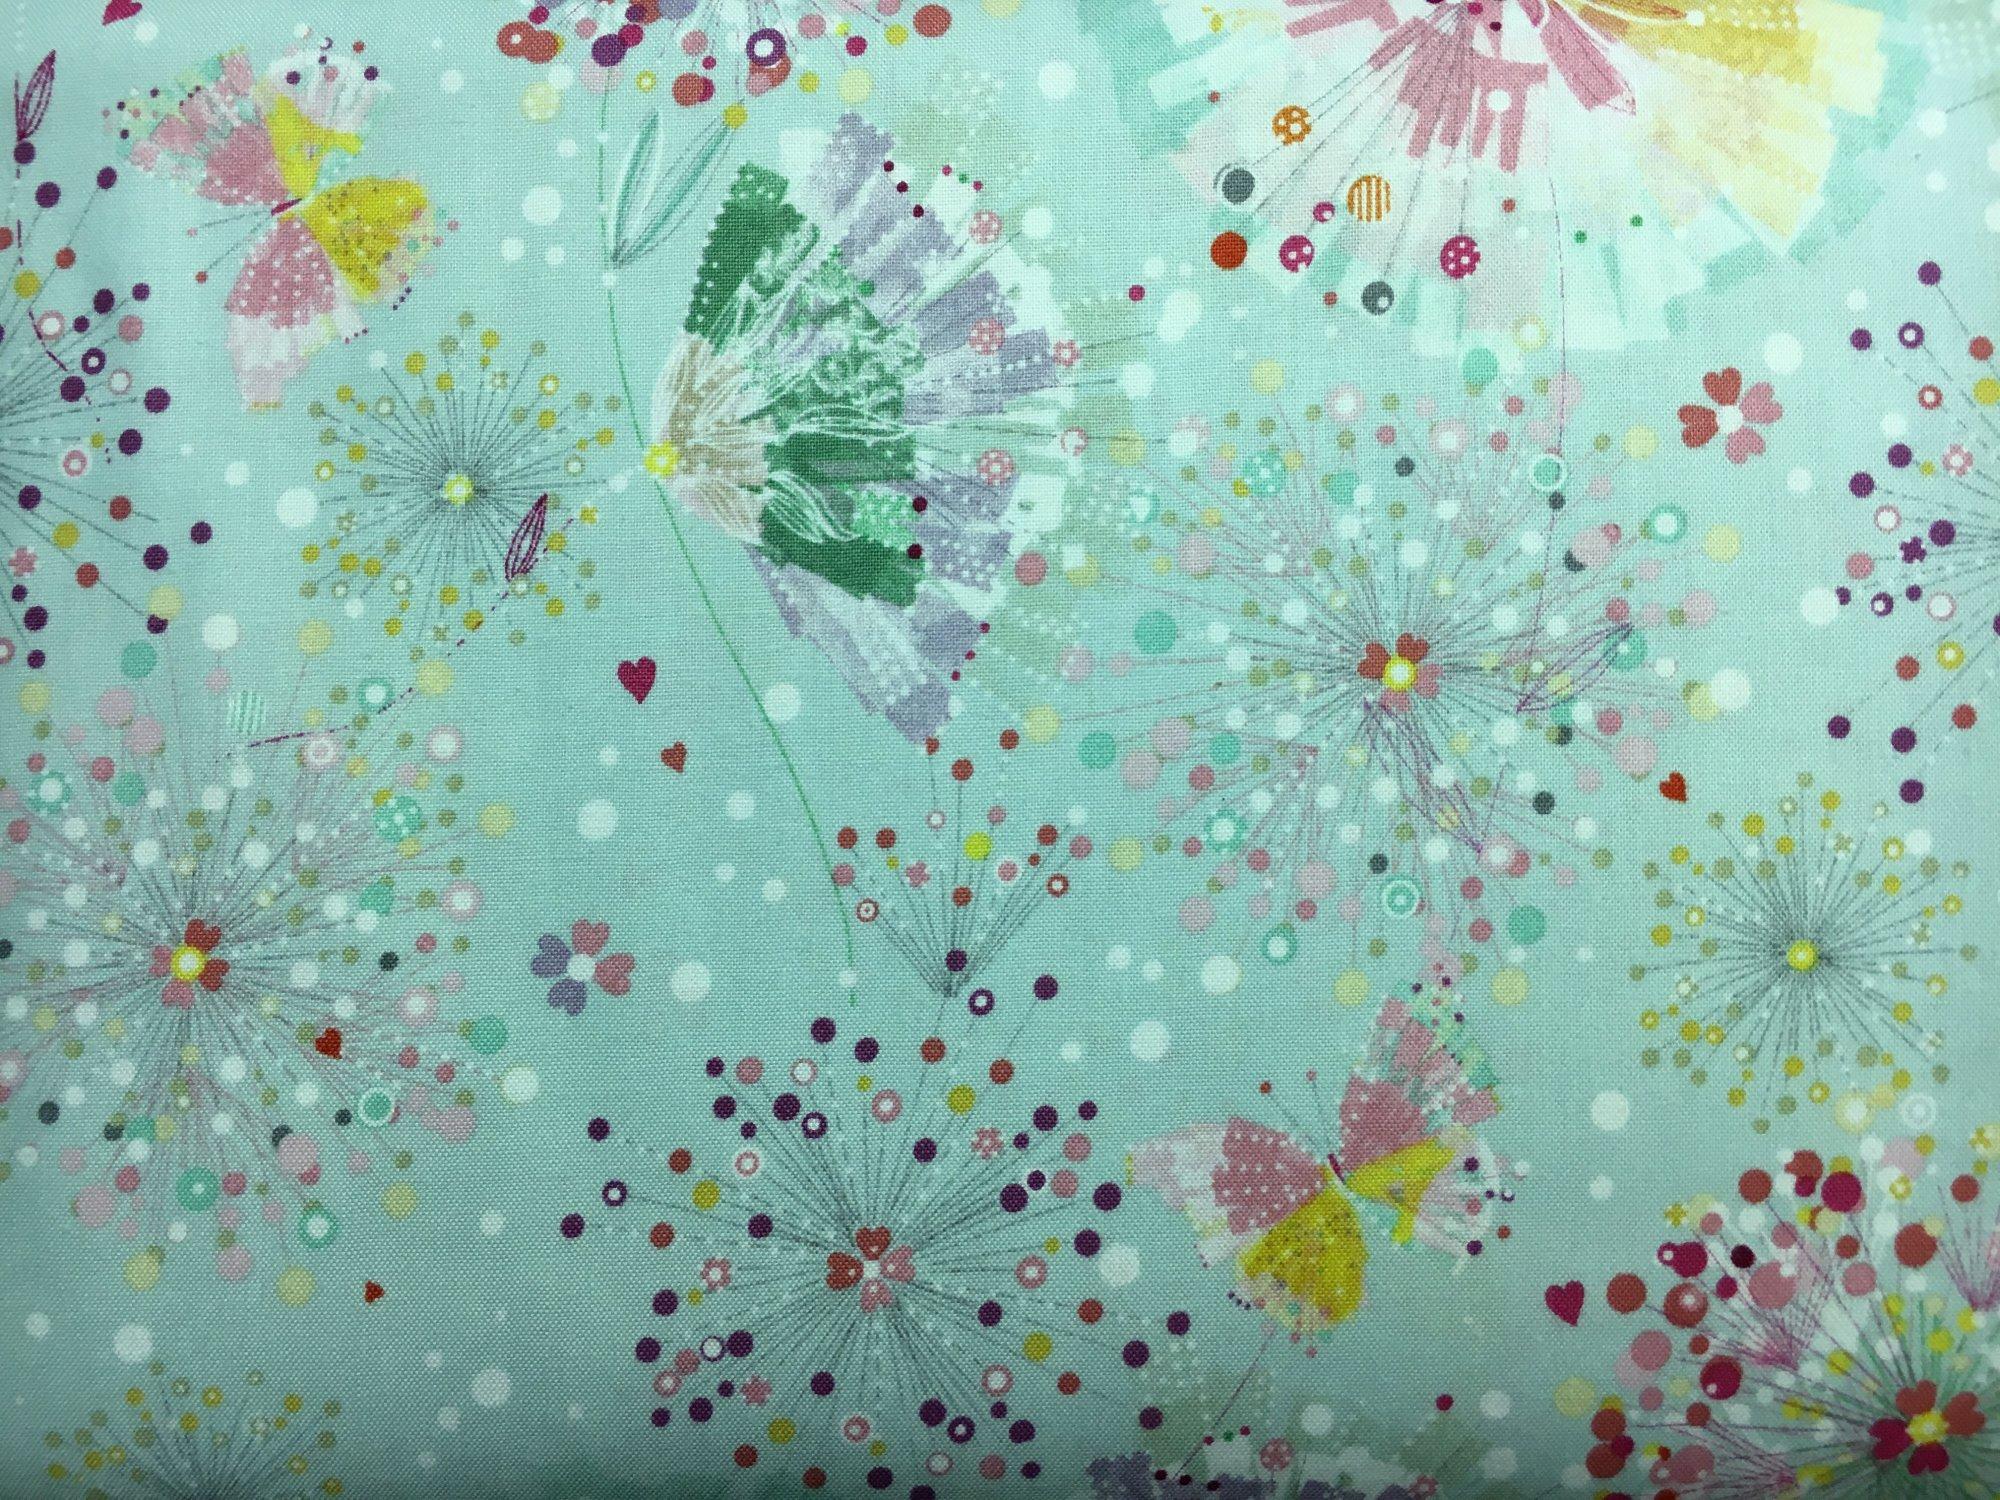 Quilting Treasures; Confetti Blossom fabrics (multi prints)